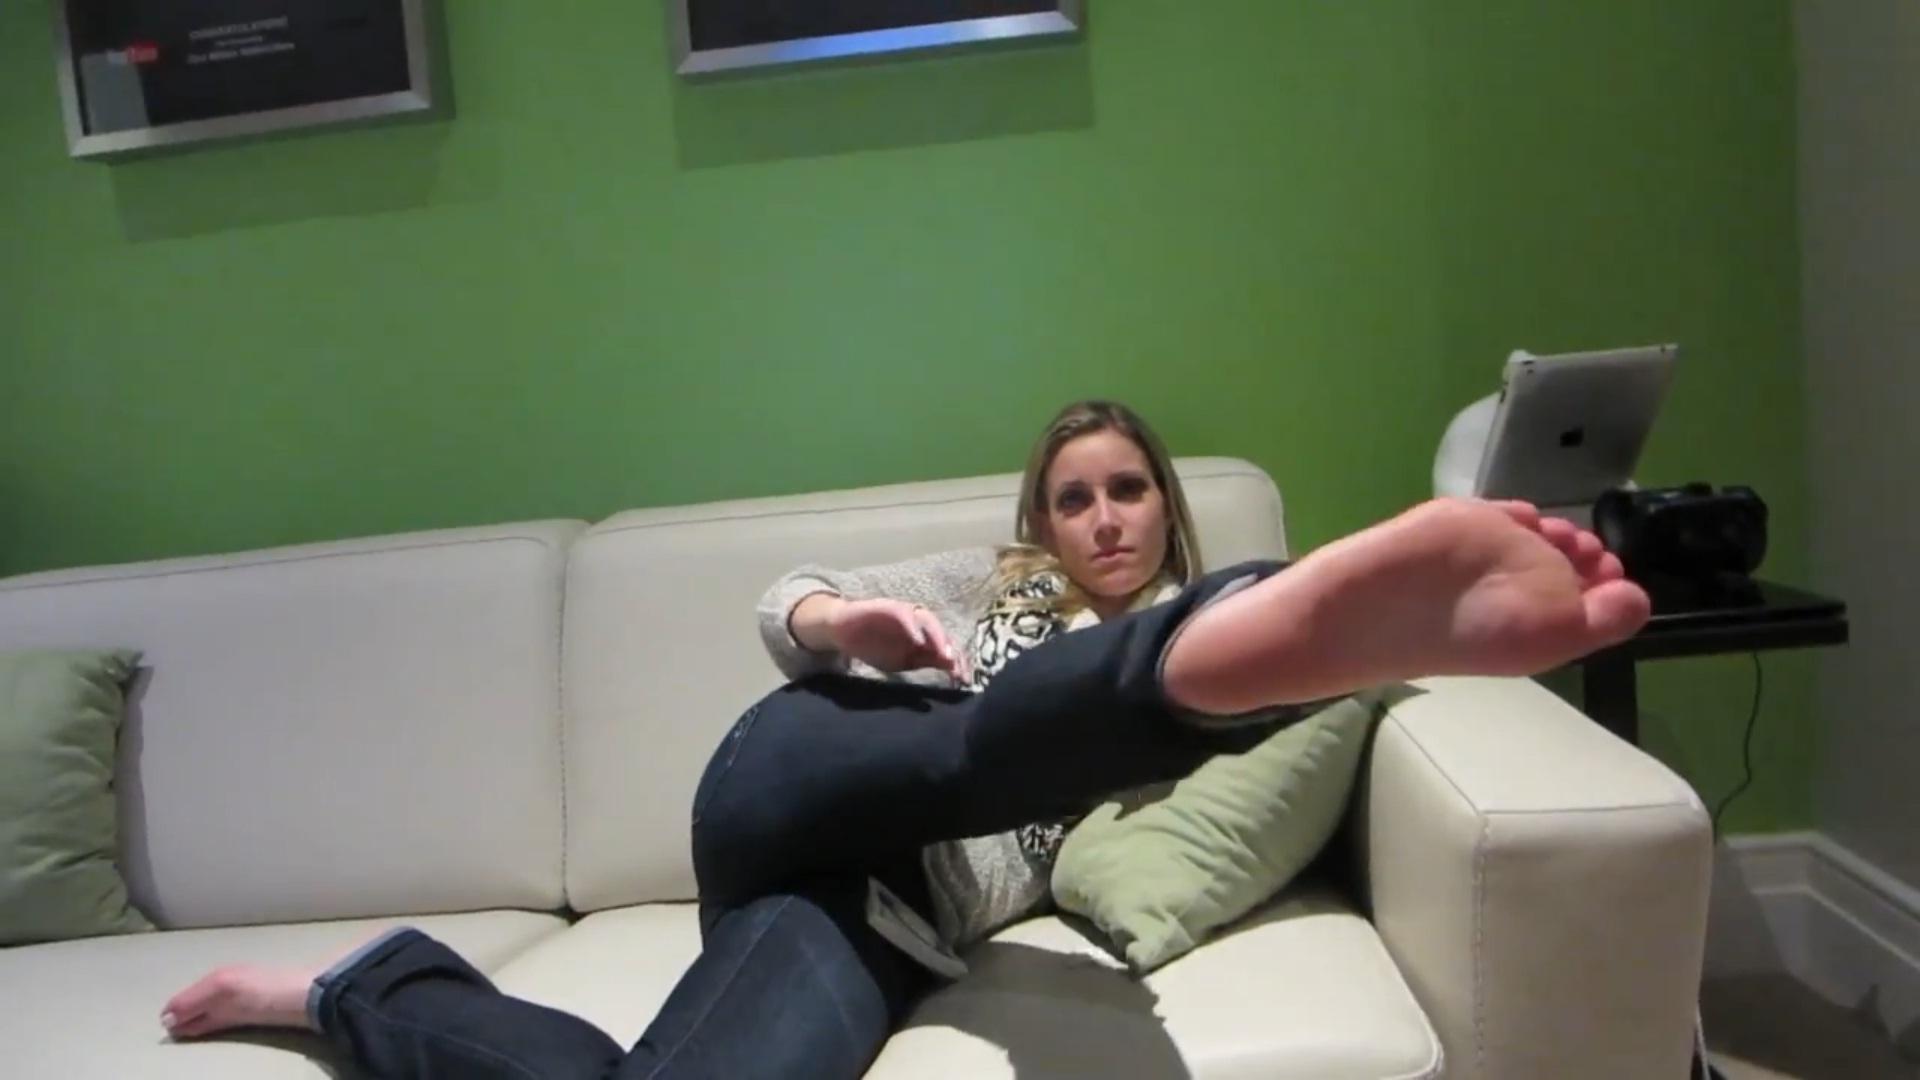 Jeana Smith Naked jeana smith's feet - free mobile porn video